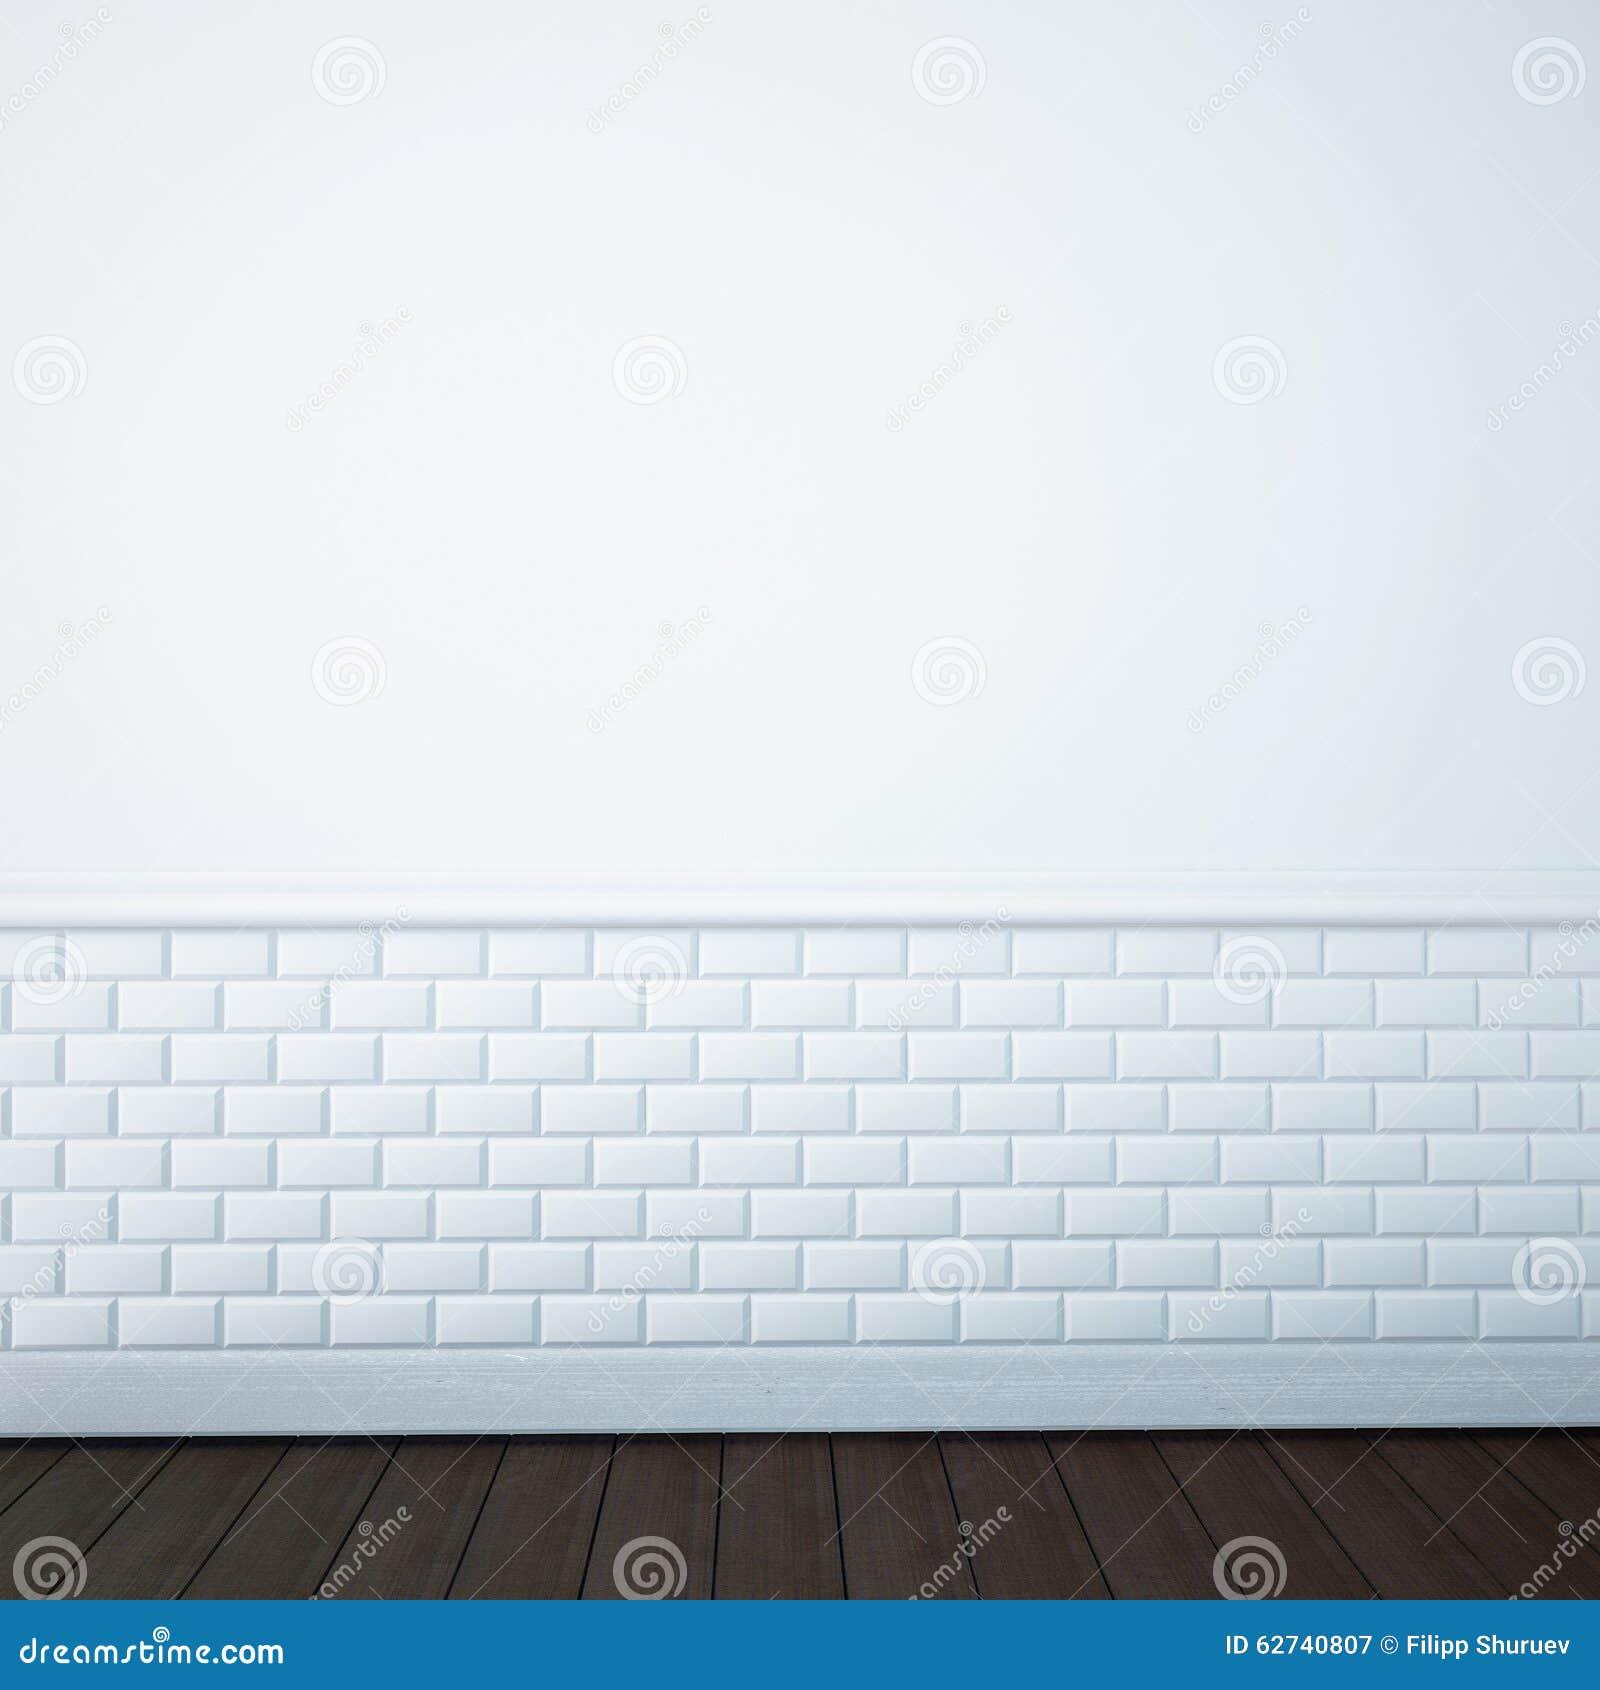 Classic bathroom tile - Render Of An Empty Bathroom Wall 3d Stock Illustration